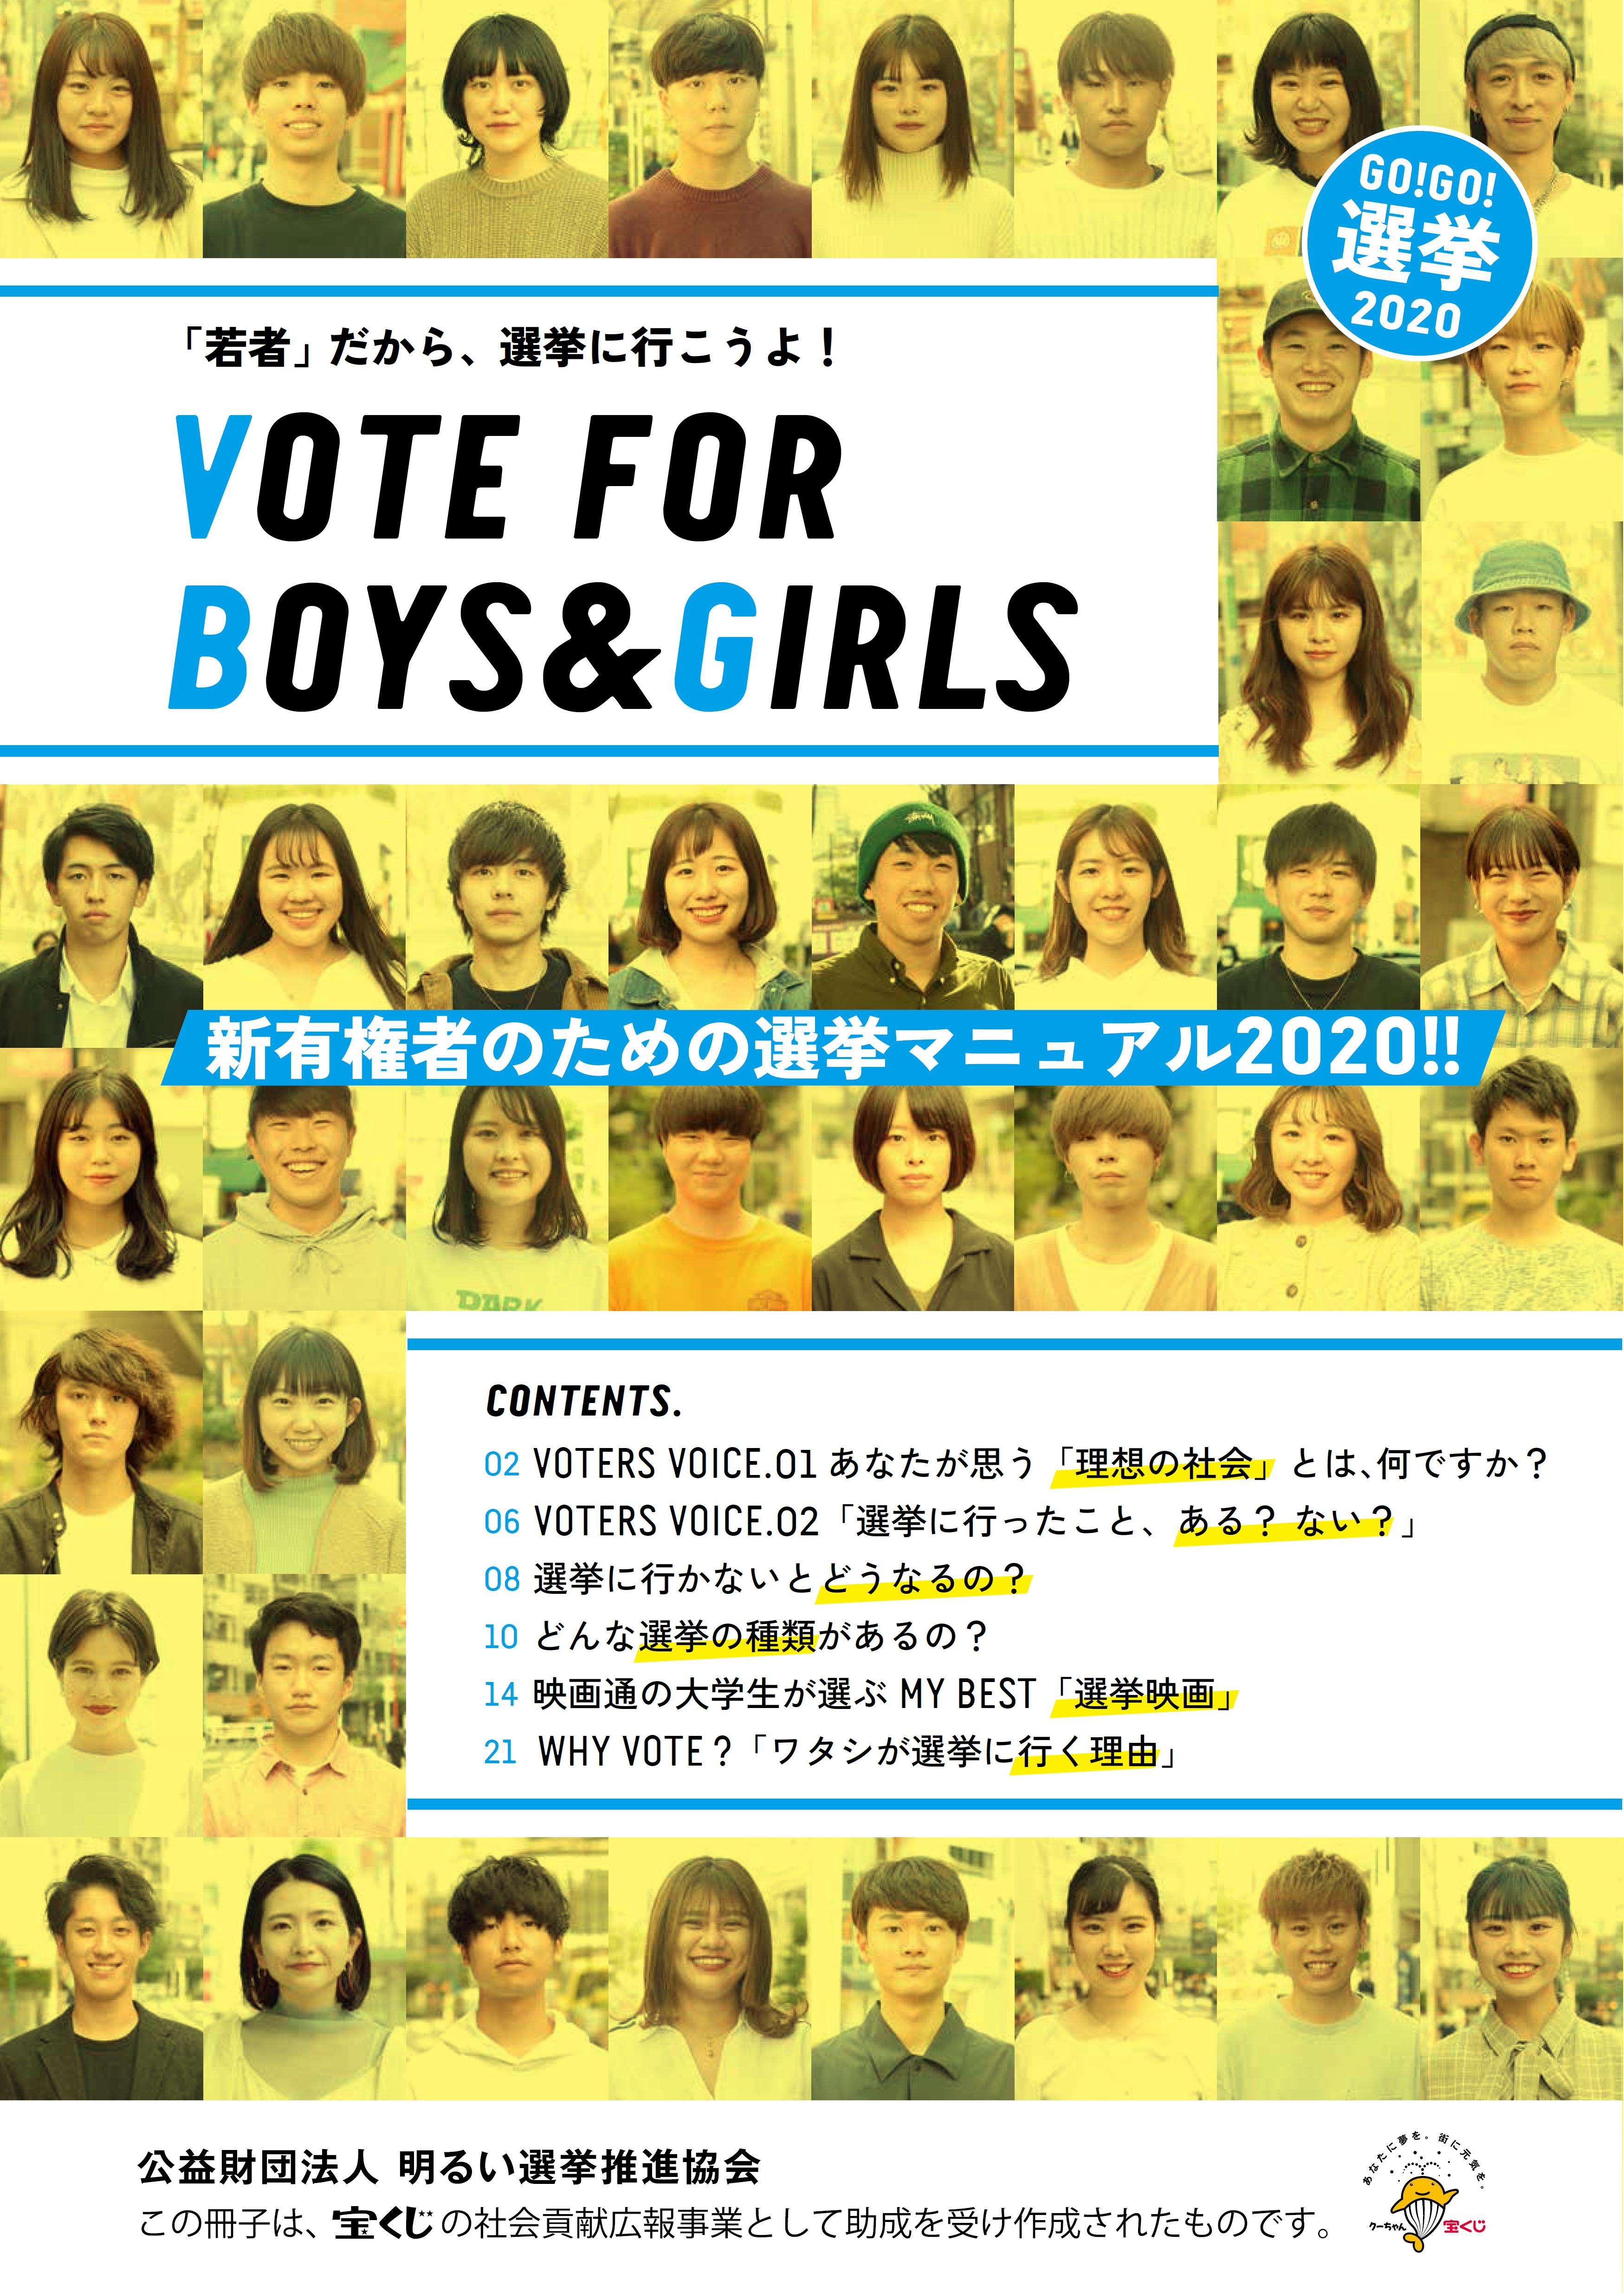 VOTE FOR BOYS&GIRLS